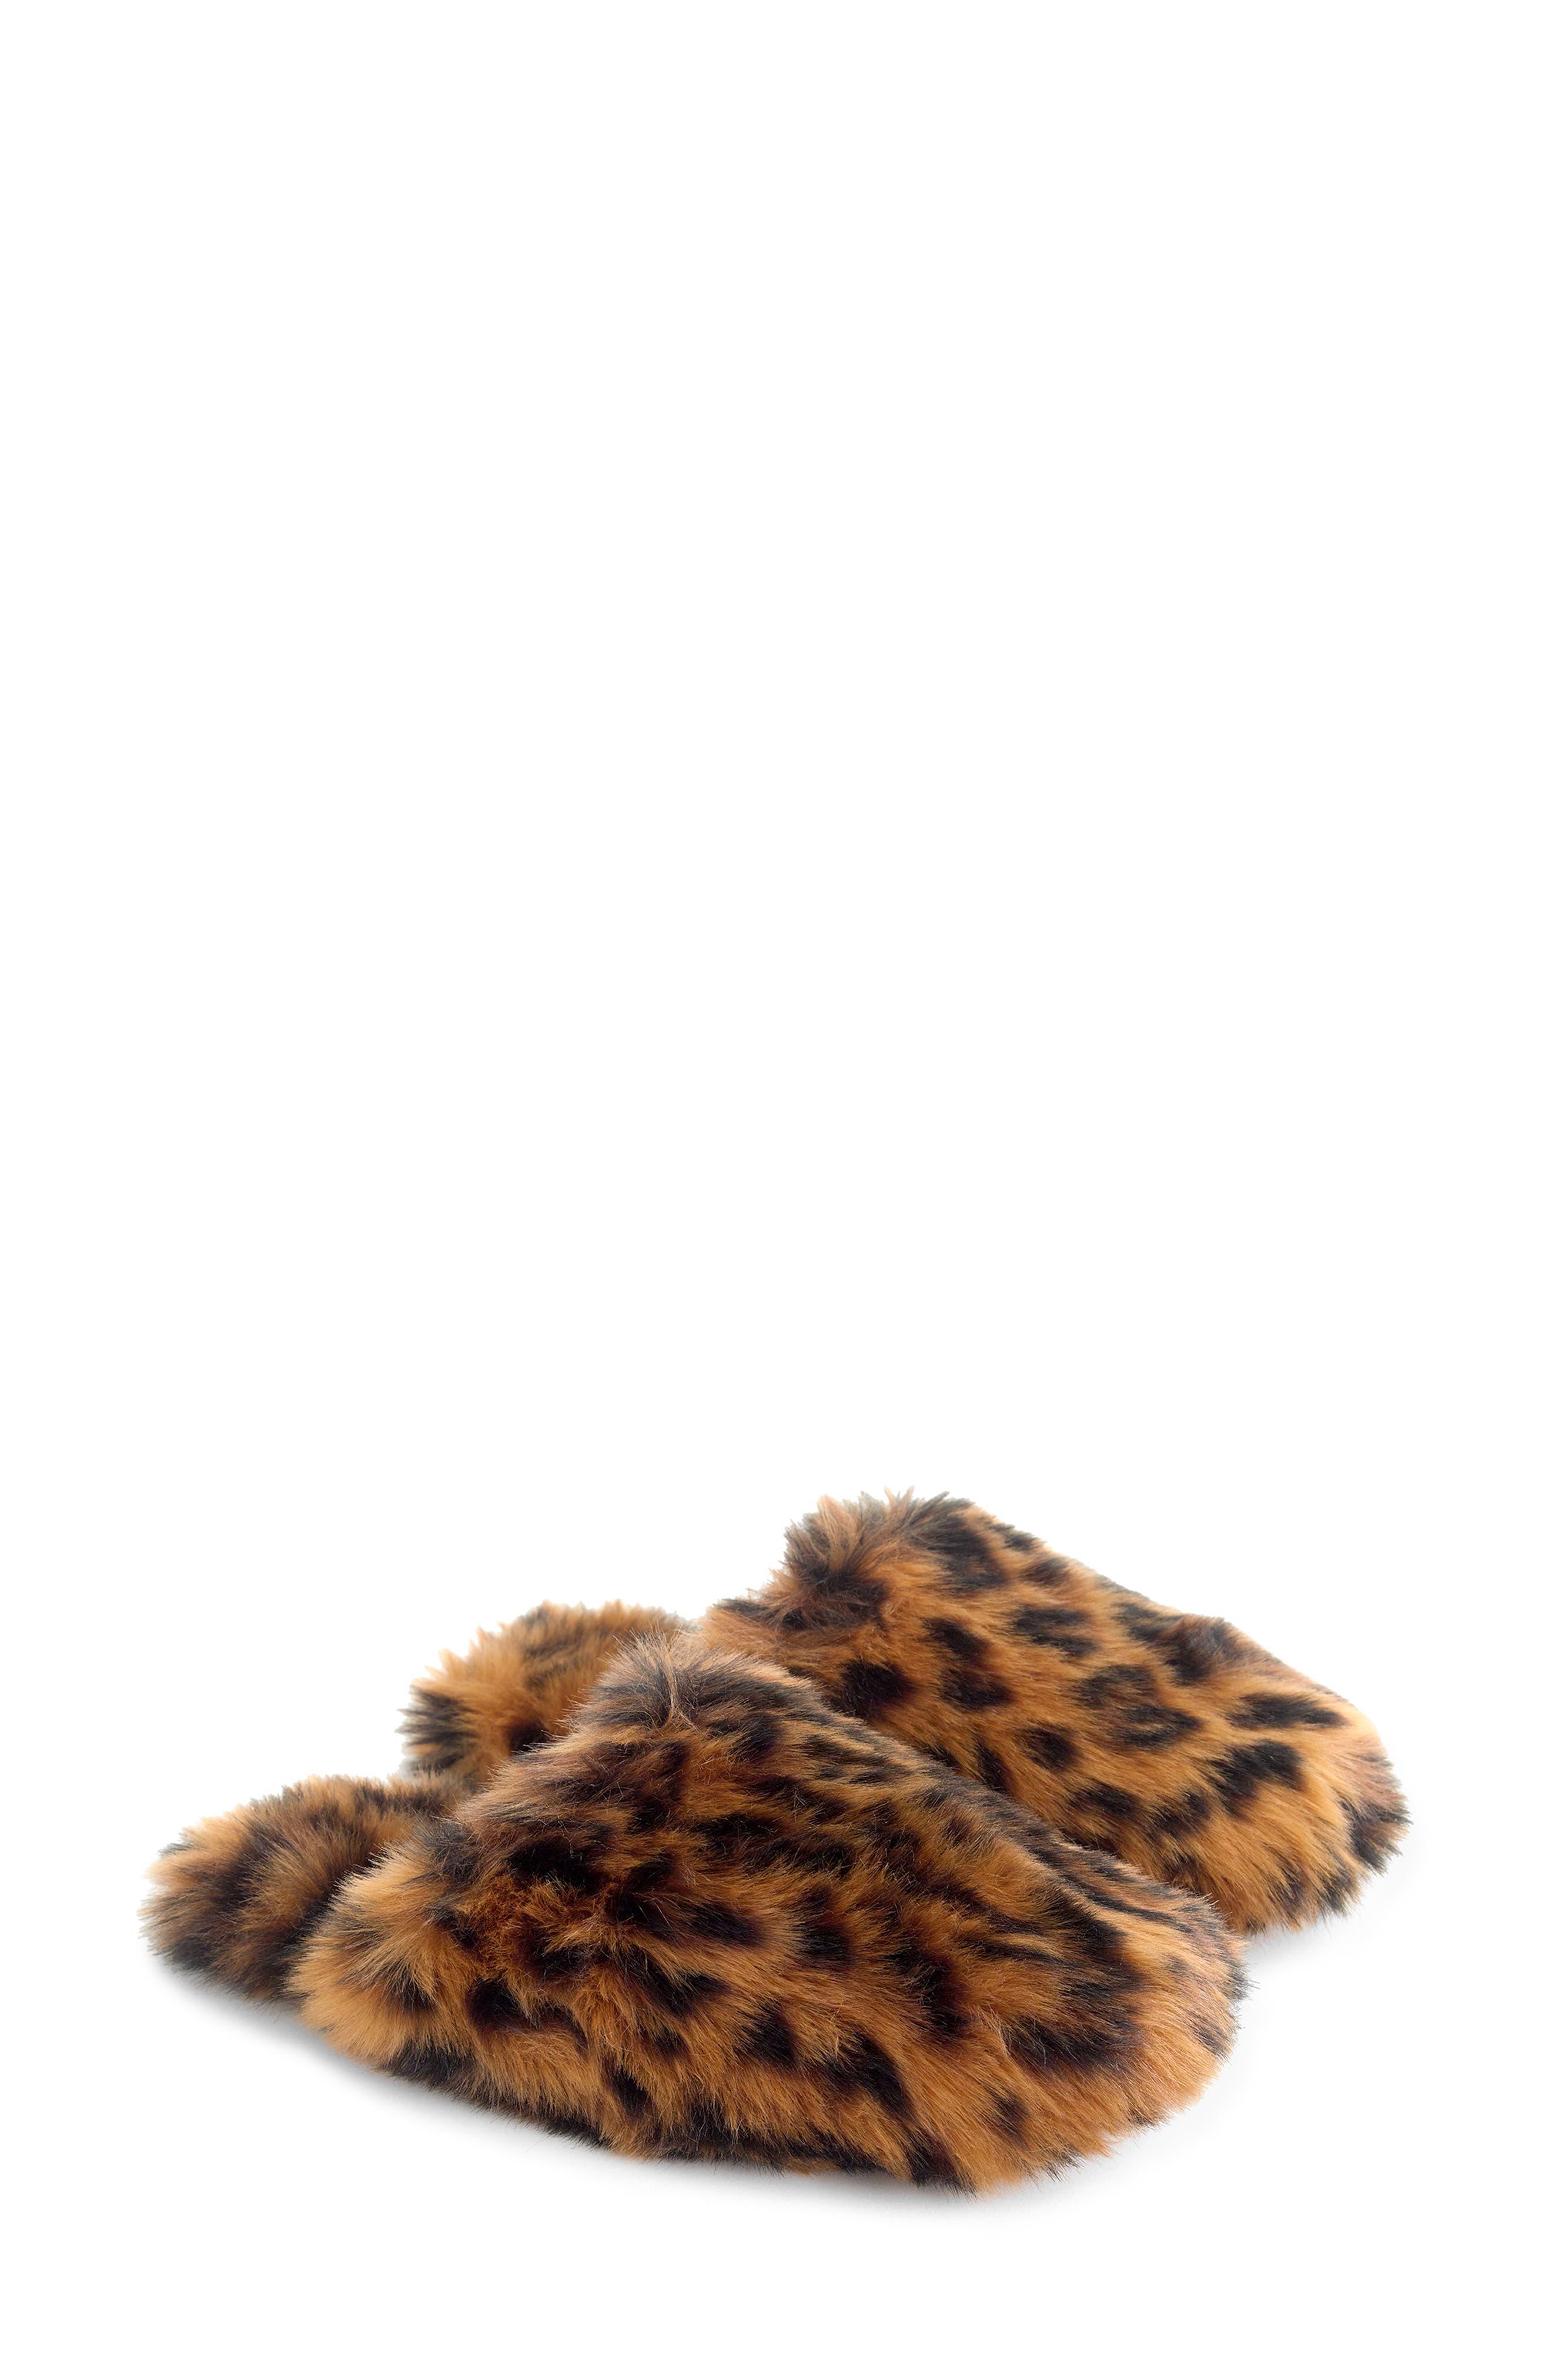 J.CREW,                             Faux Fur Slipper,                             Main thumbnail 1, color,                             200